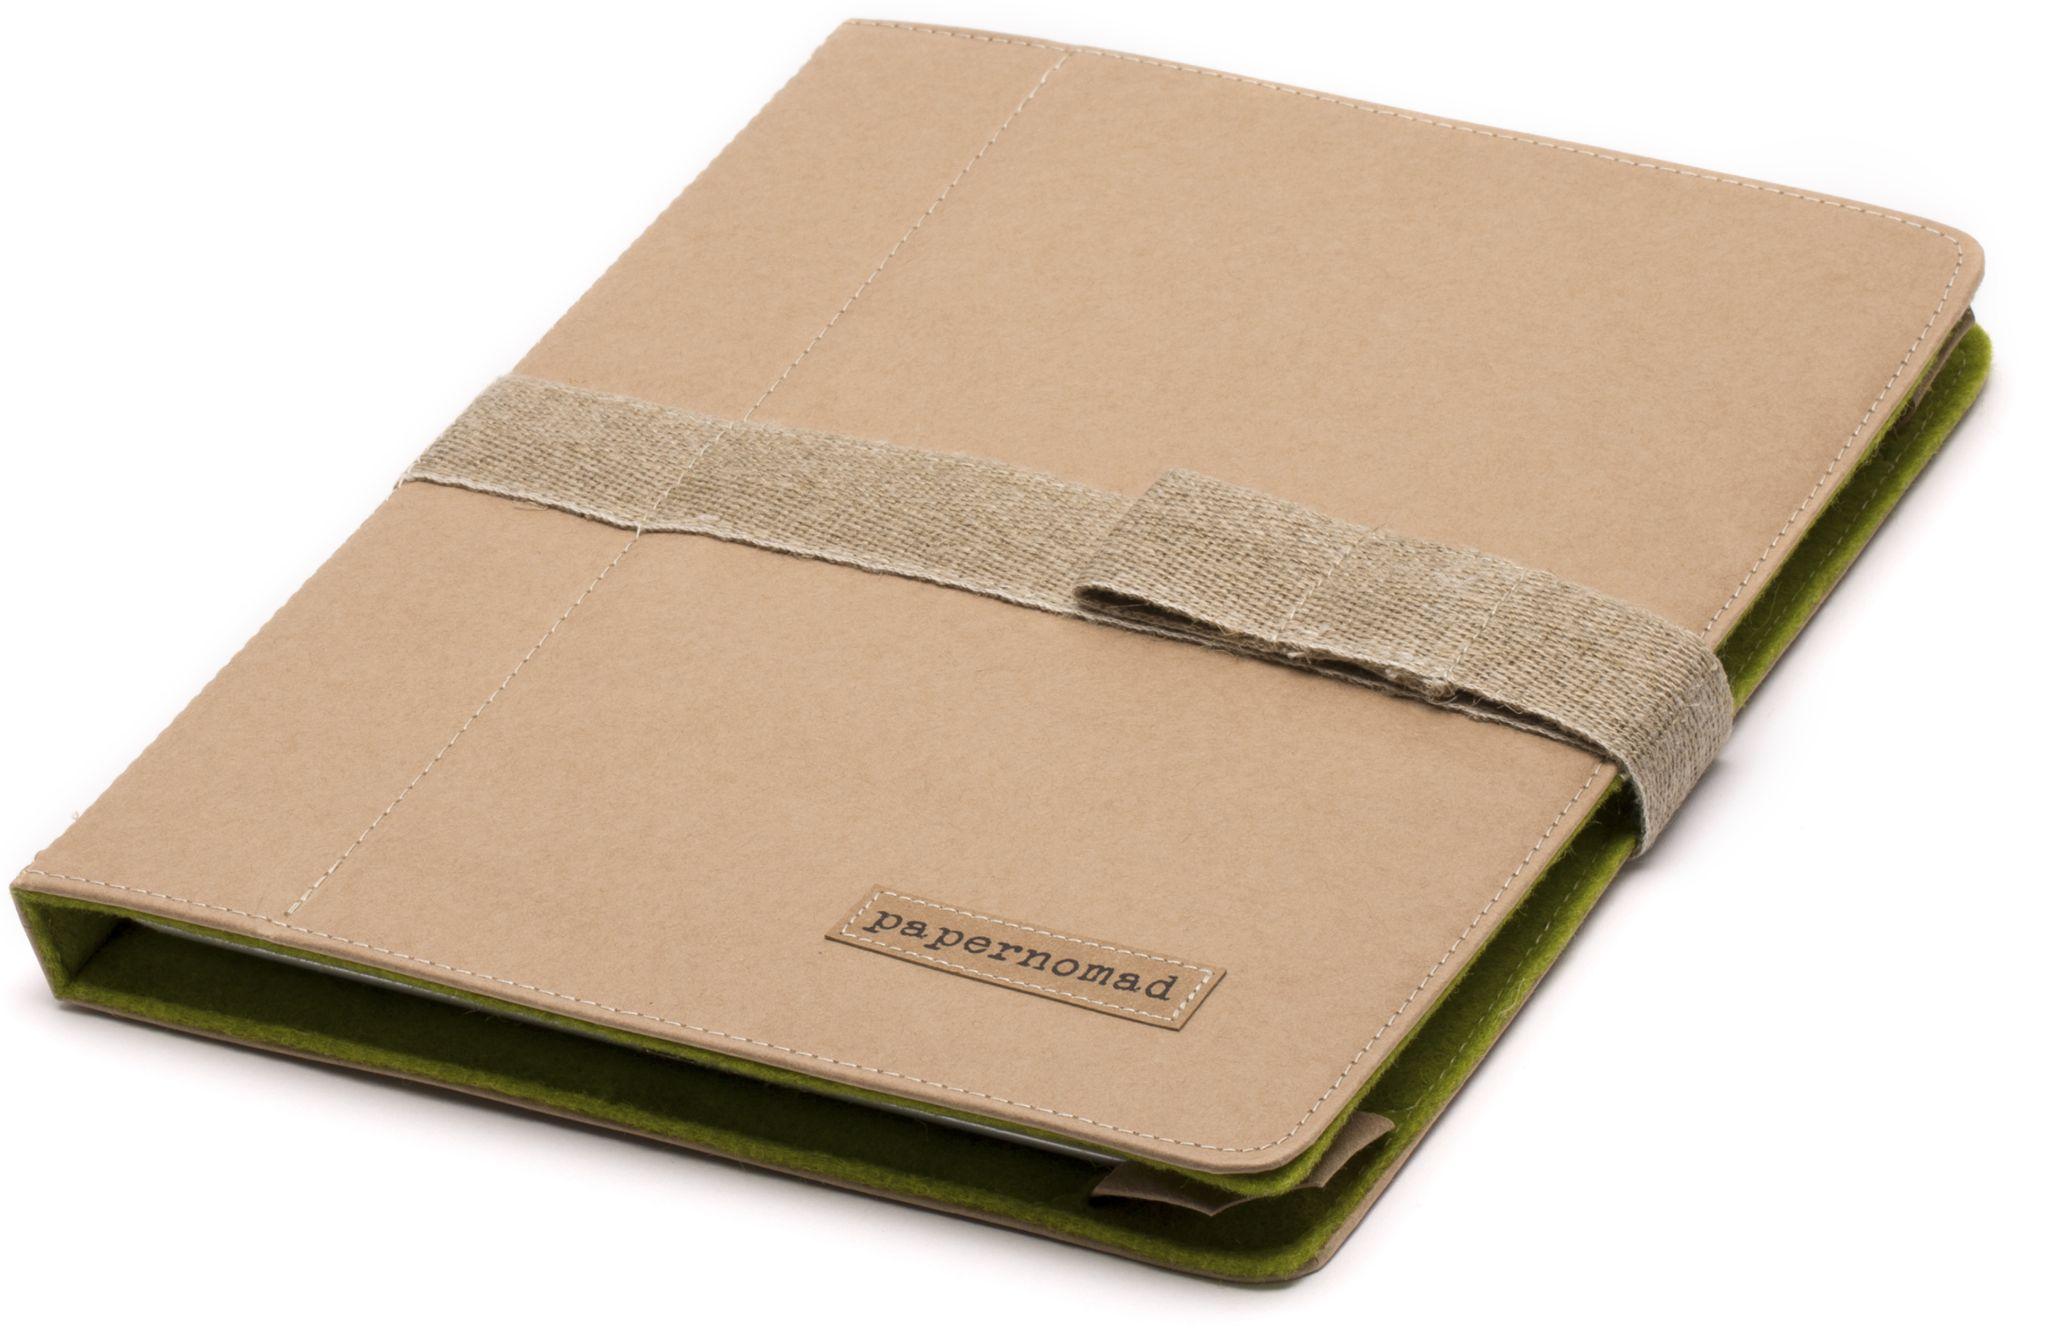 Papernomad Tootsie Folio for iPad Air (image 001)